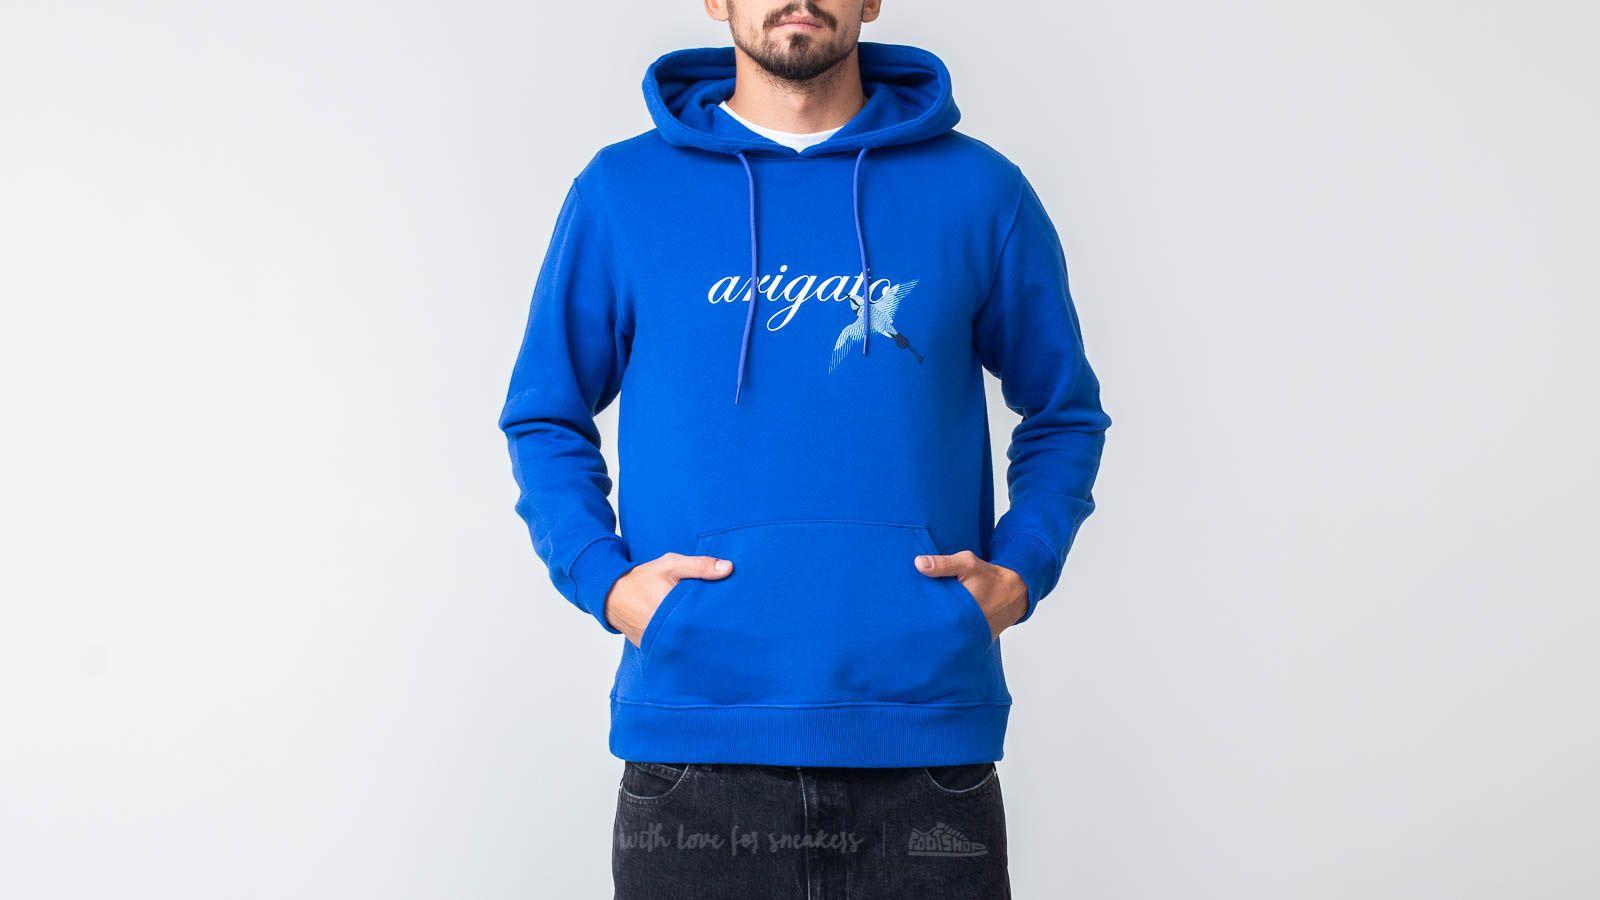 AXEL ARIGATO Tonal Tori Hoodie Royal Blue za skvělou cenu 2 330 Kč koupíte na Footshop.cz